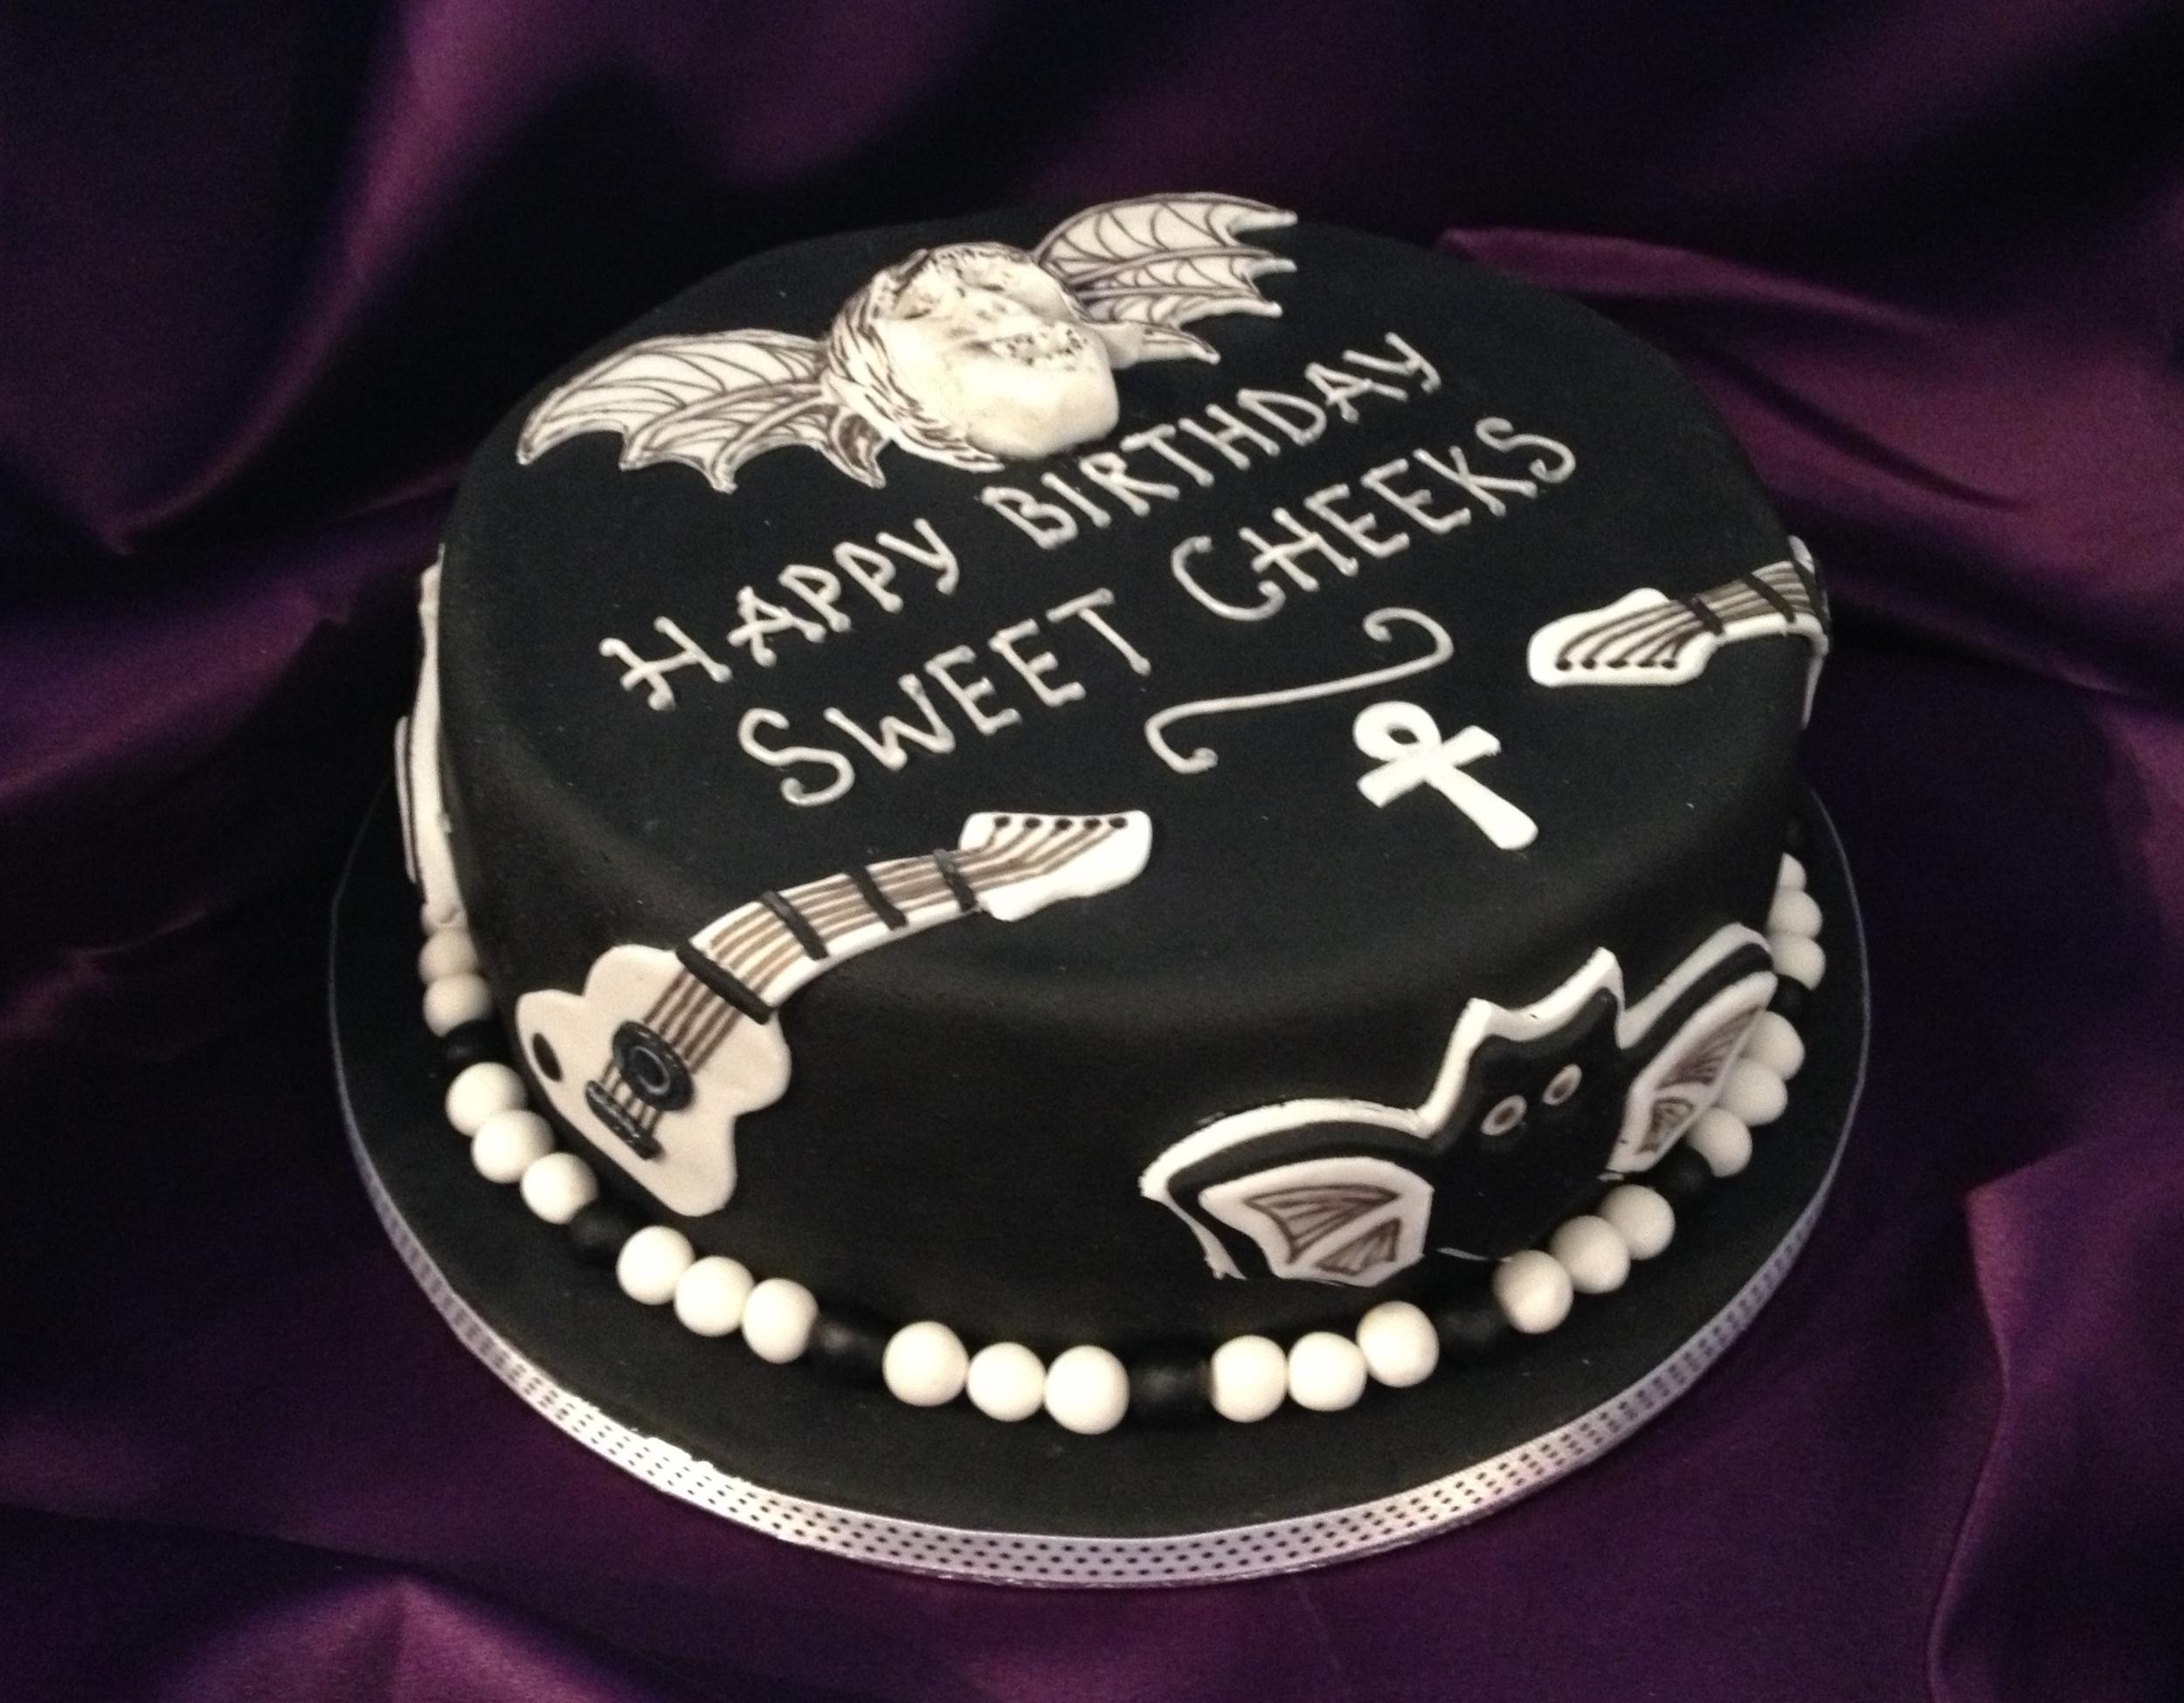 My Holy Trinity Happy Birthday Crispin Glover Robert Smith And